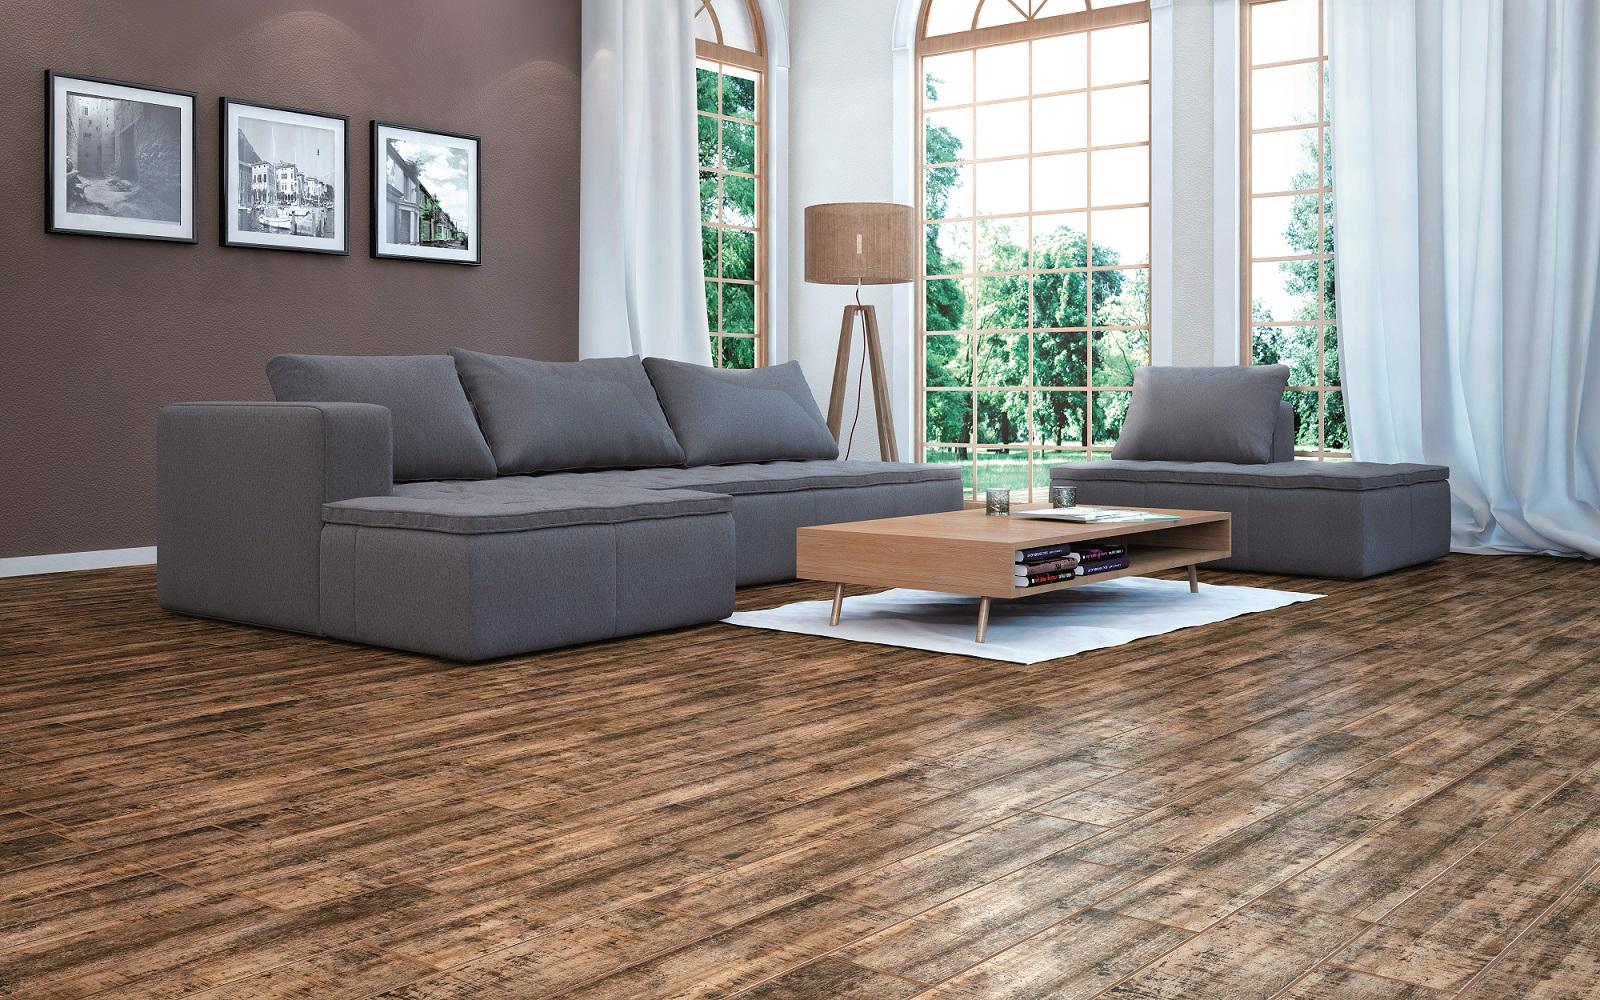 holzoptik bodenfliesen wandfliesen celtis braun 17 5x60cm feinsteinzeug ebay. Black Bedroom Furniture Sets. Home Design Ideas